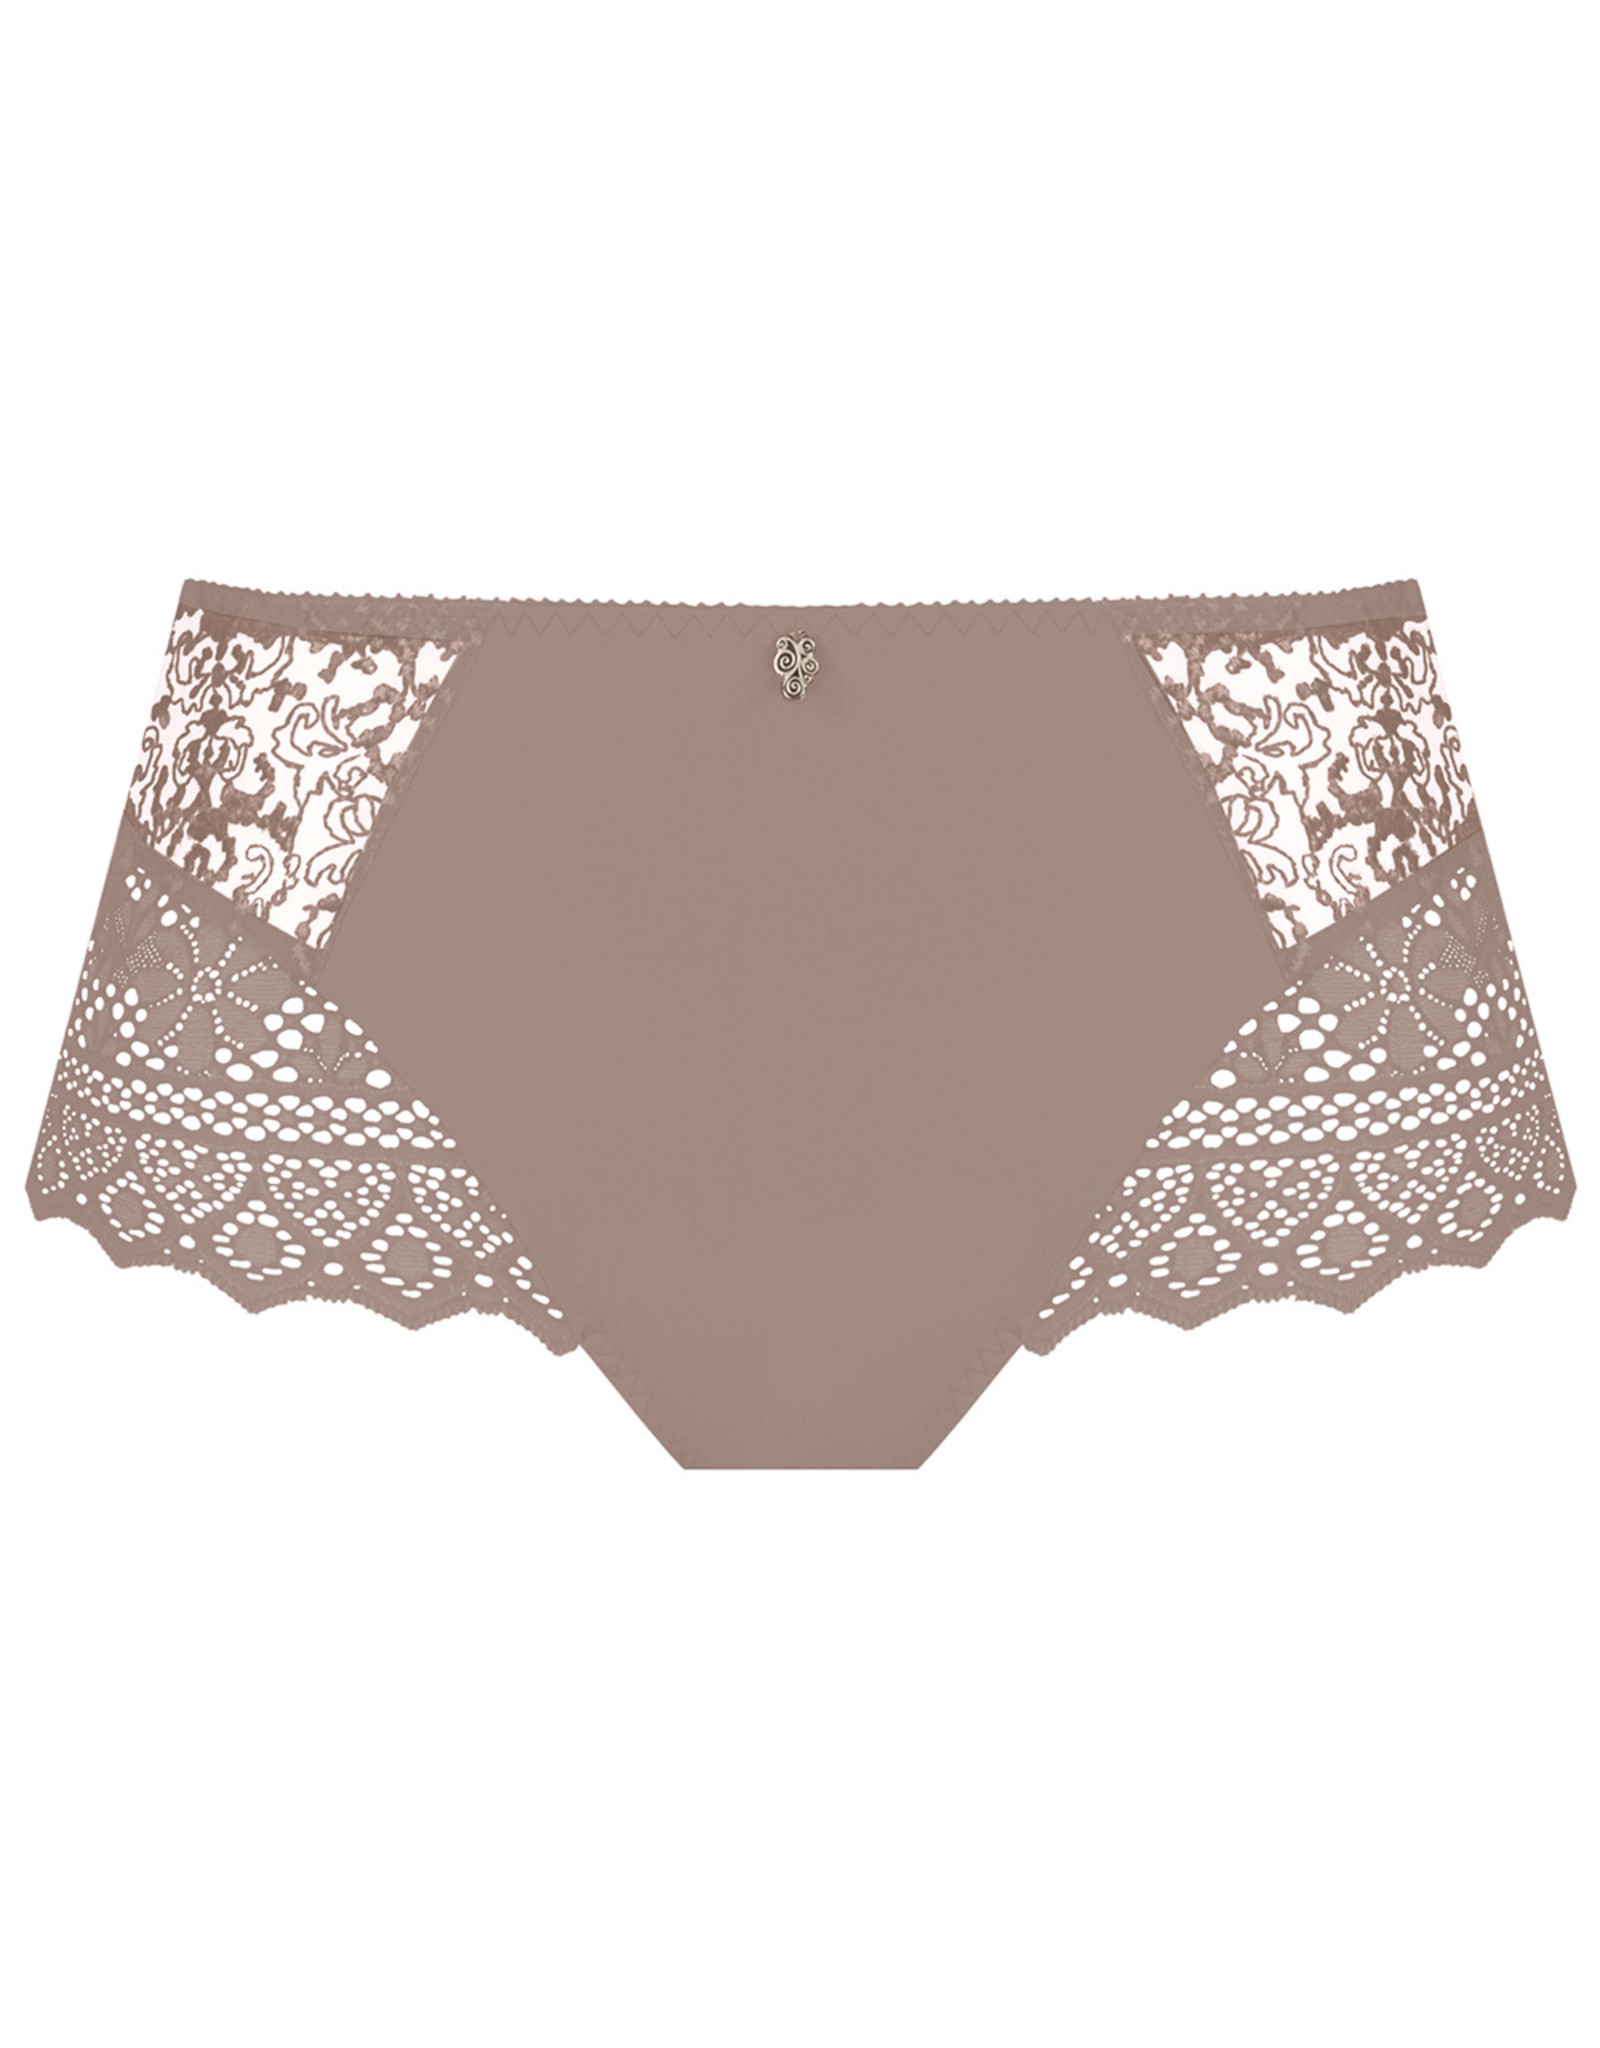 Empriente Cassiopee Panty (Full Brief) 05151